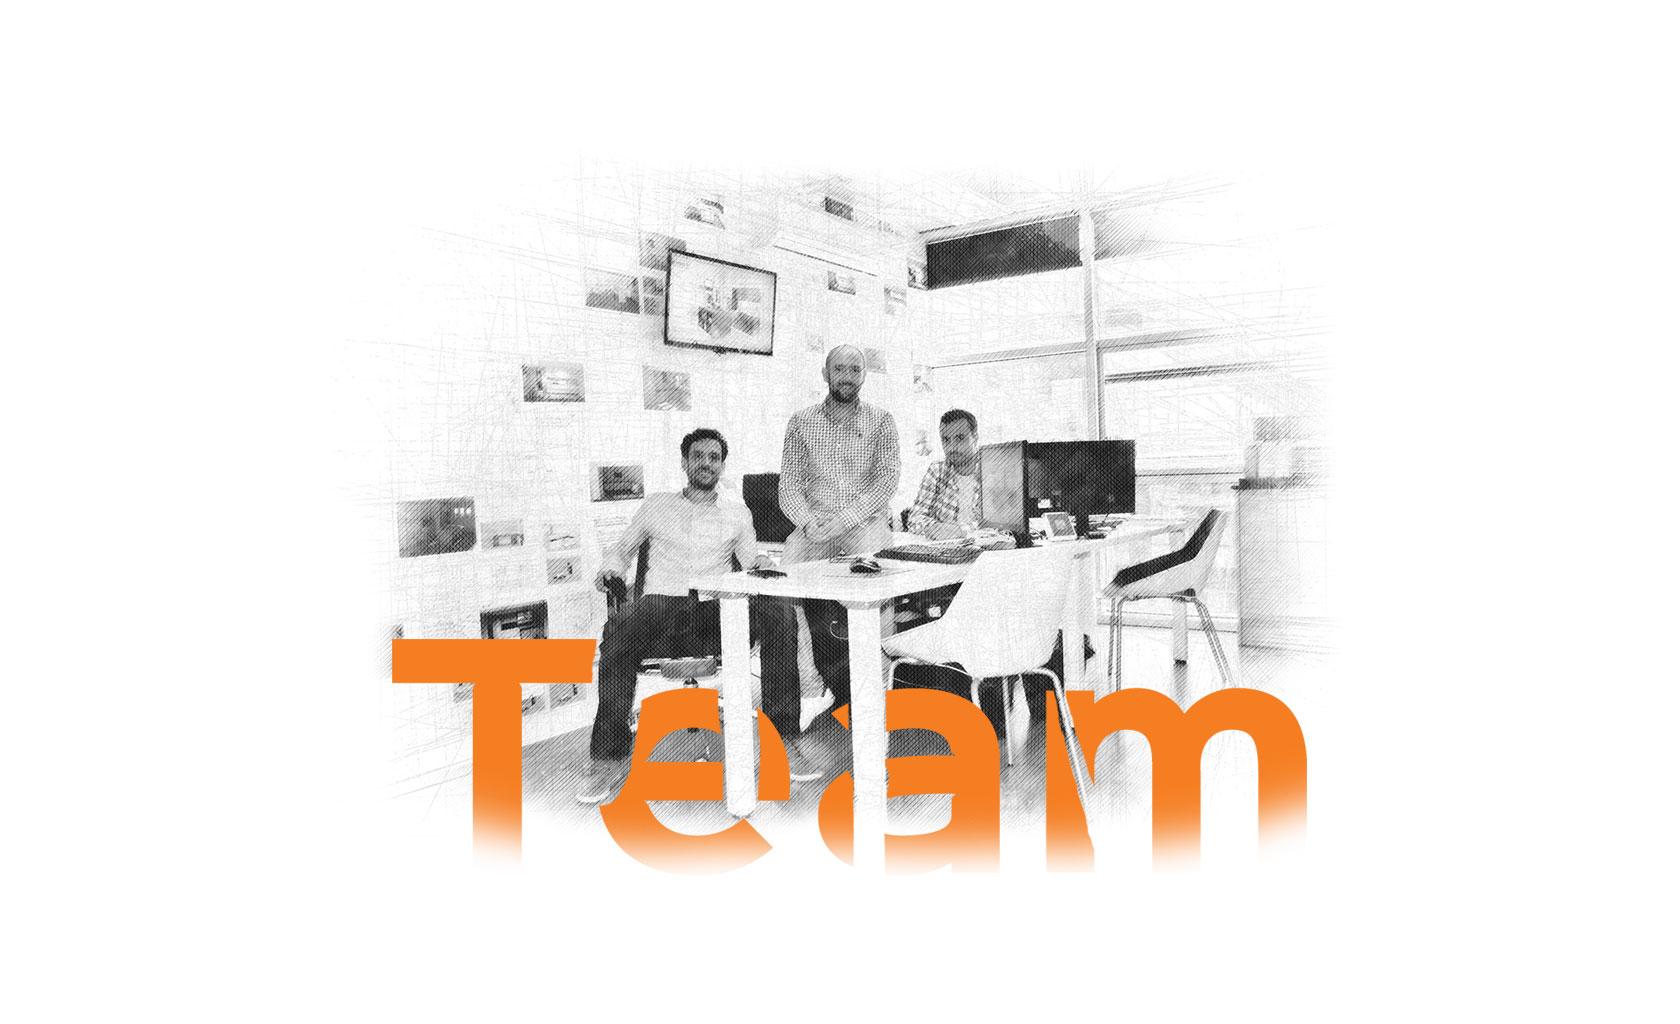 team-estudior2-boceto